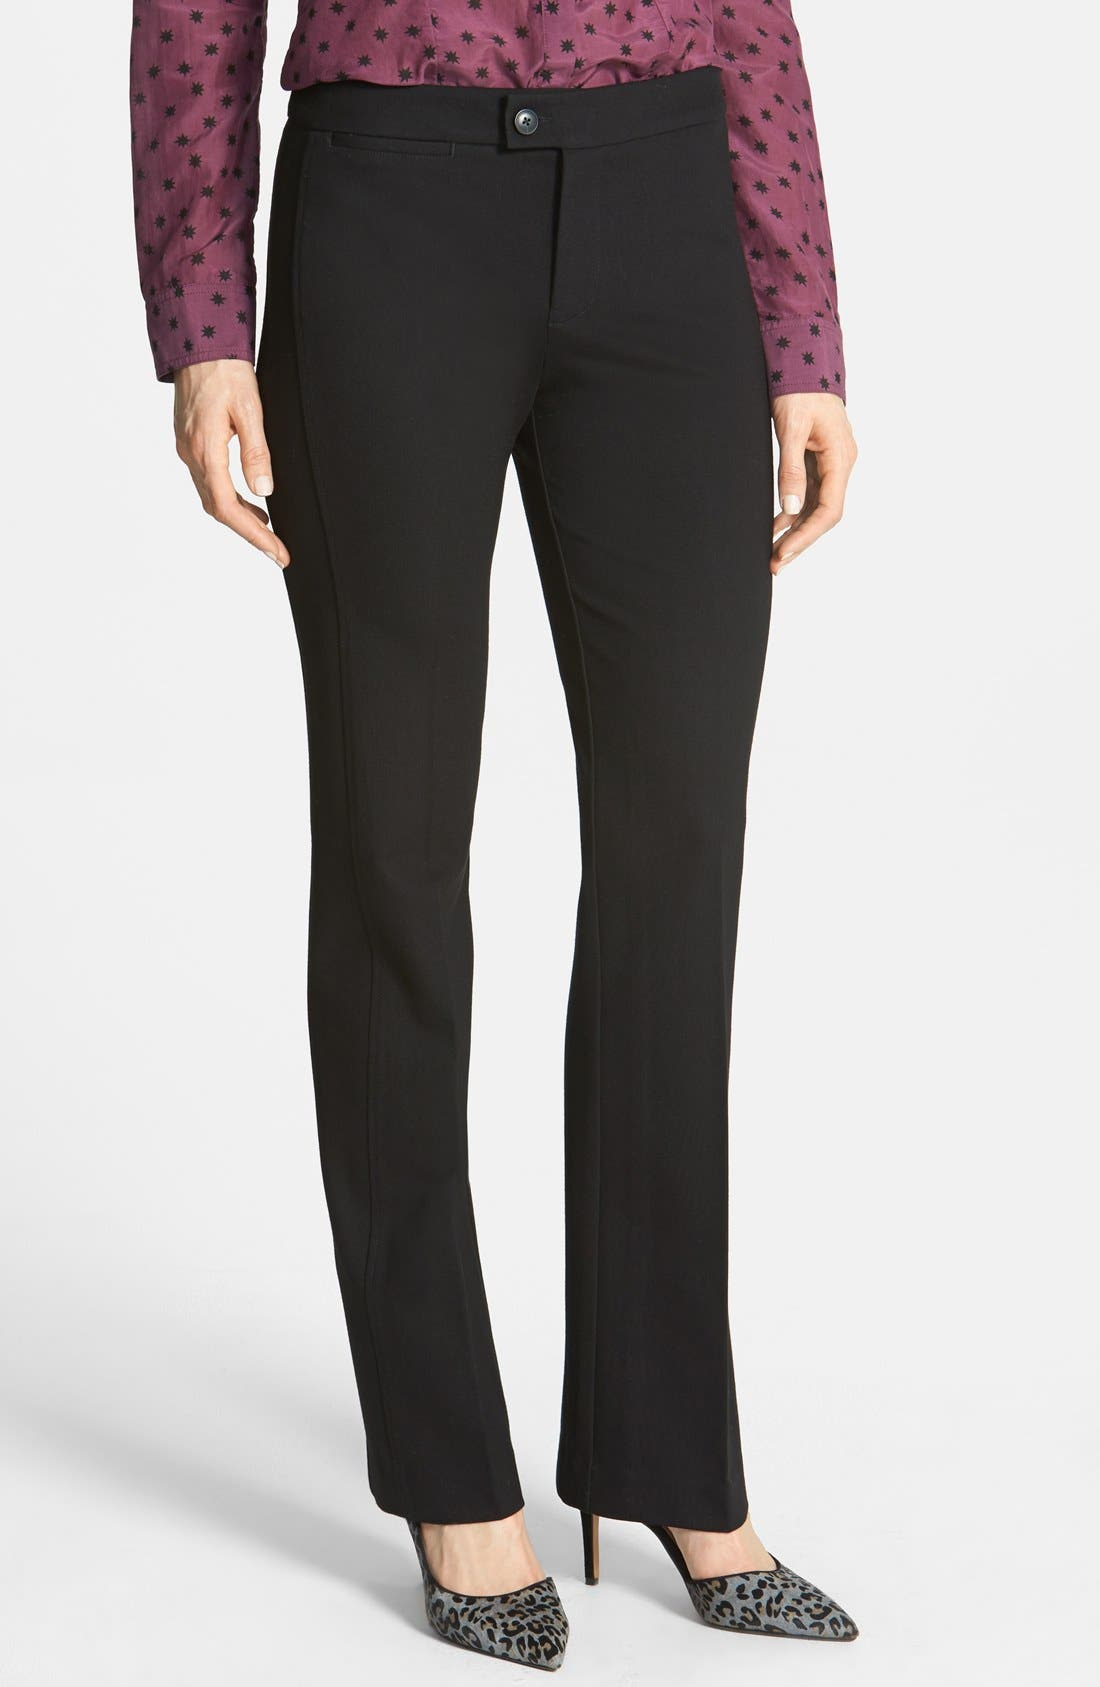 Main Image - NYDJ Stretch Ponte Knit Trousers (Petite)